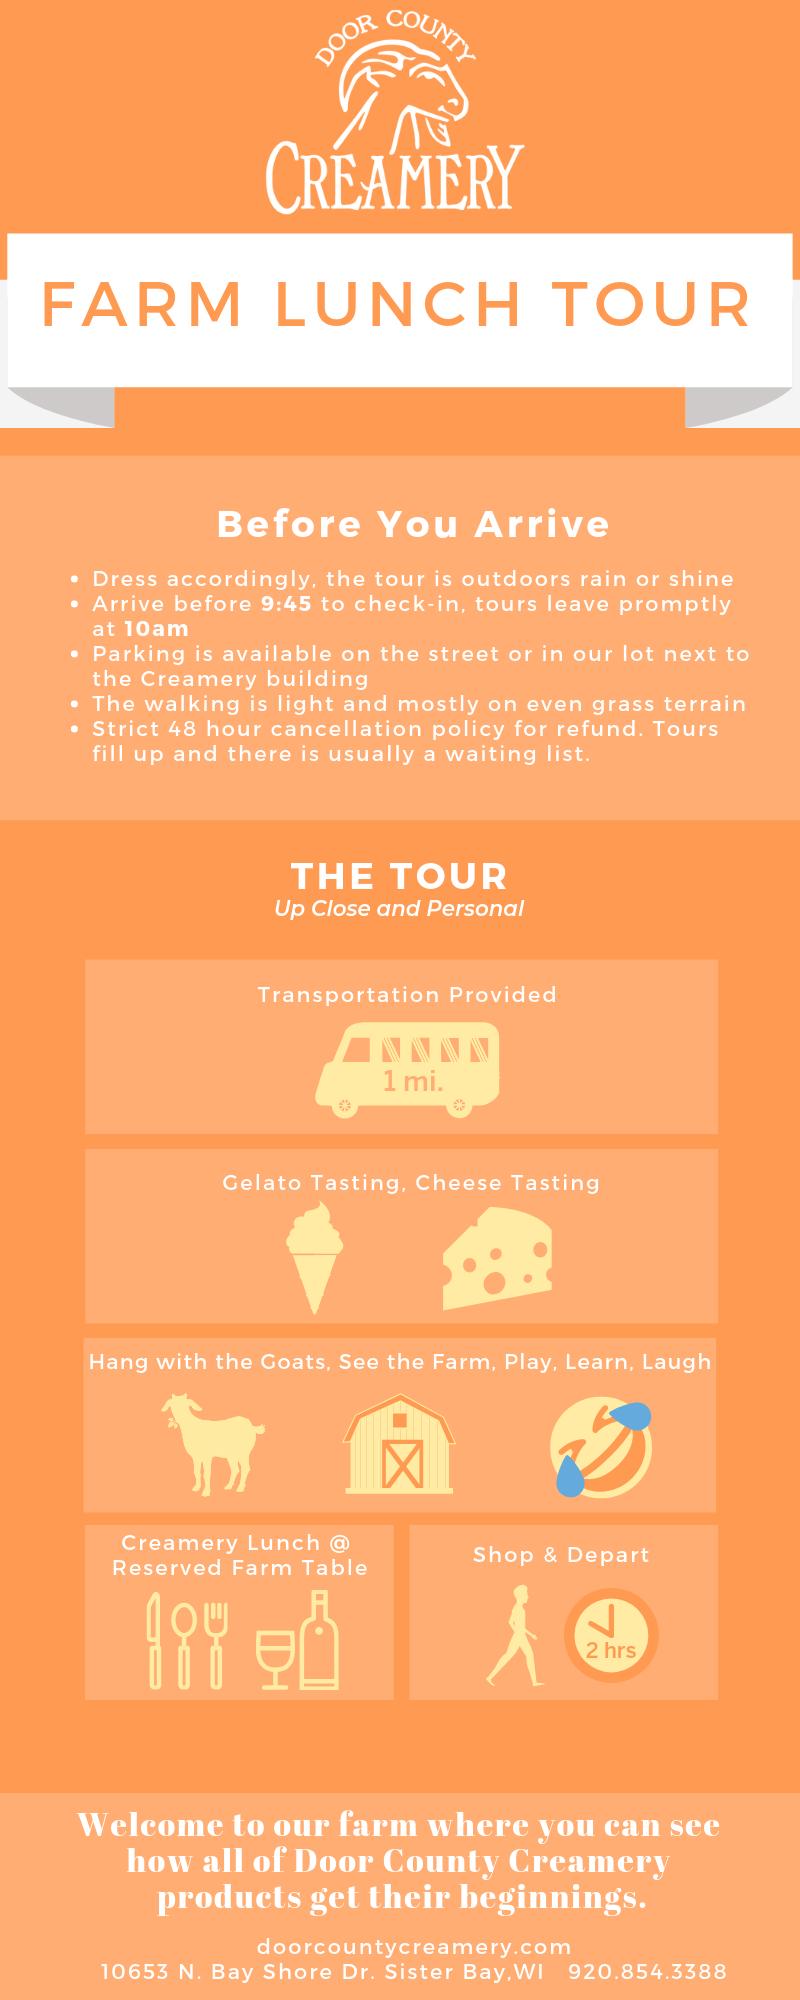 farm-tour-info.png